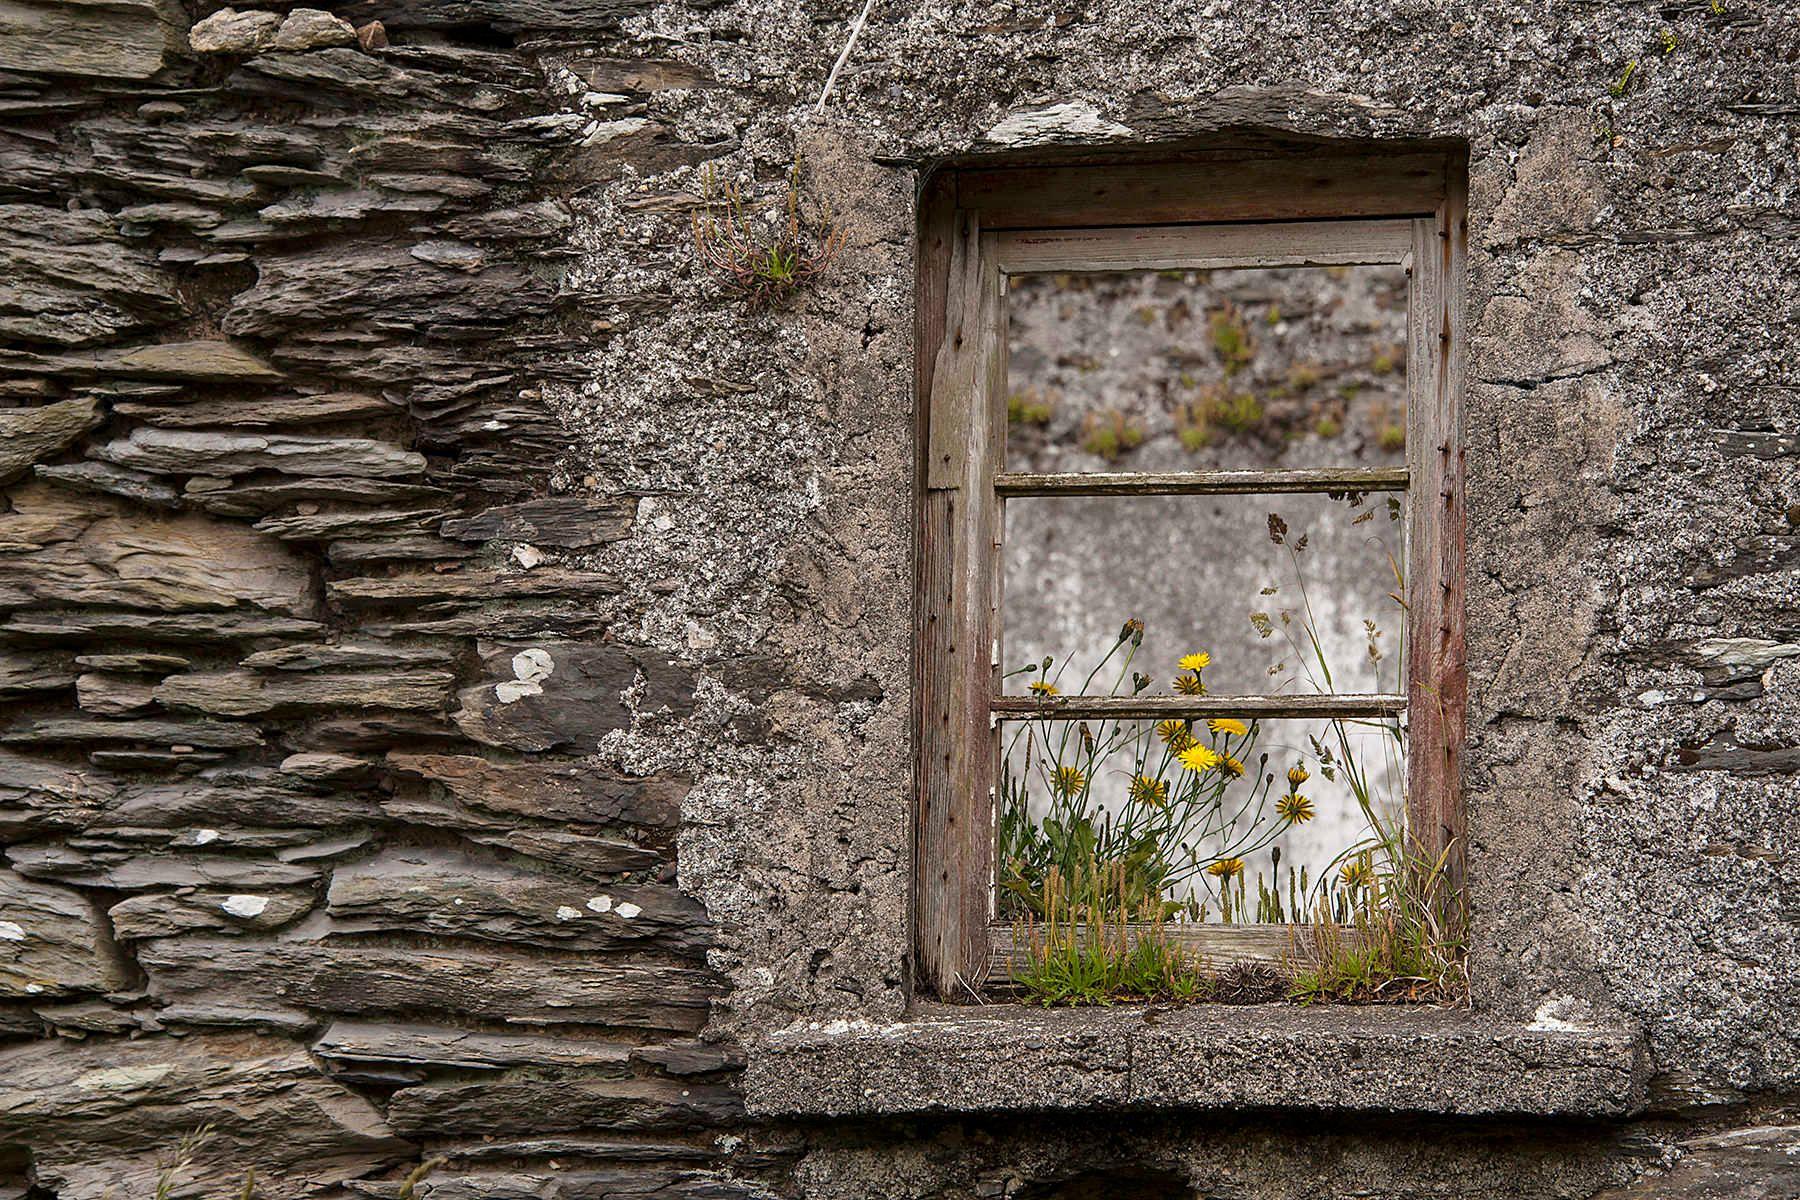 4_1dsc_5995_window_abandoned_house_near_garnish.jpg